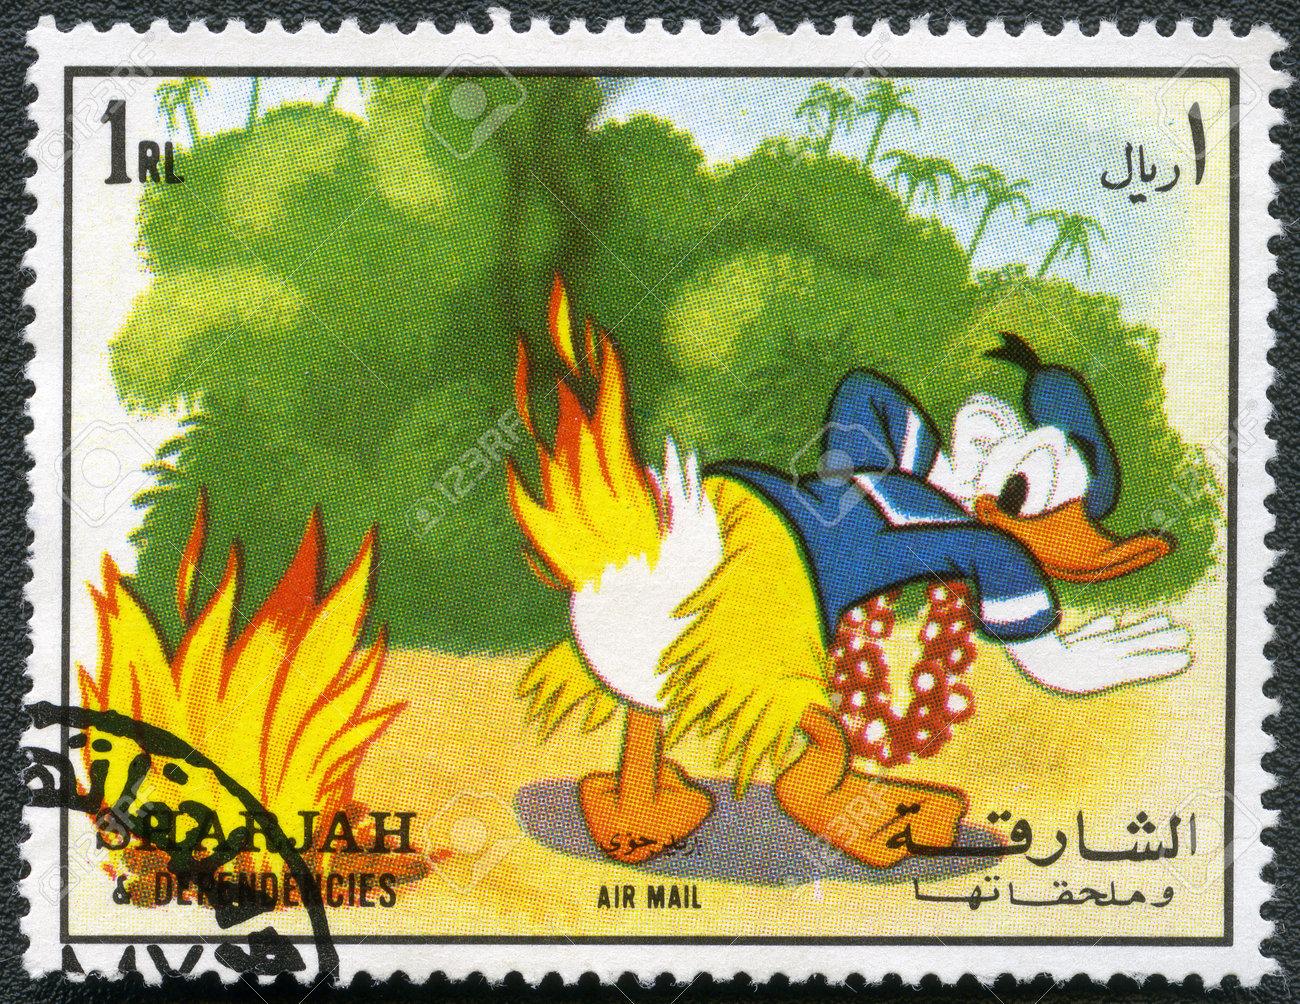 SHARJAH   DEPENDENCIES - CIRCA 1972  A stamp printed by Sharjah   Dependencies devoted fifty years of Walt Disney cartoon characters, shows Donald Duck, series, circa 1972 Stock Photo - 12505414